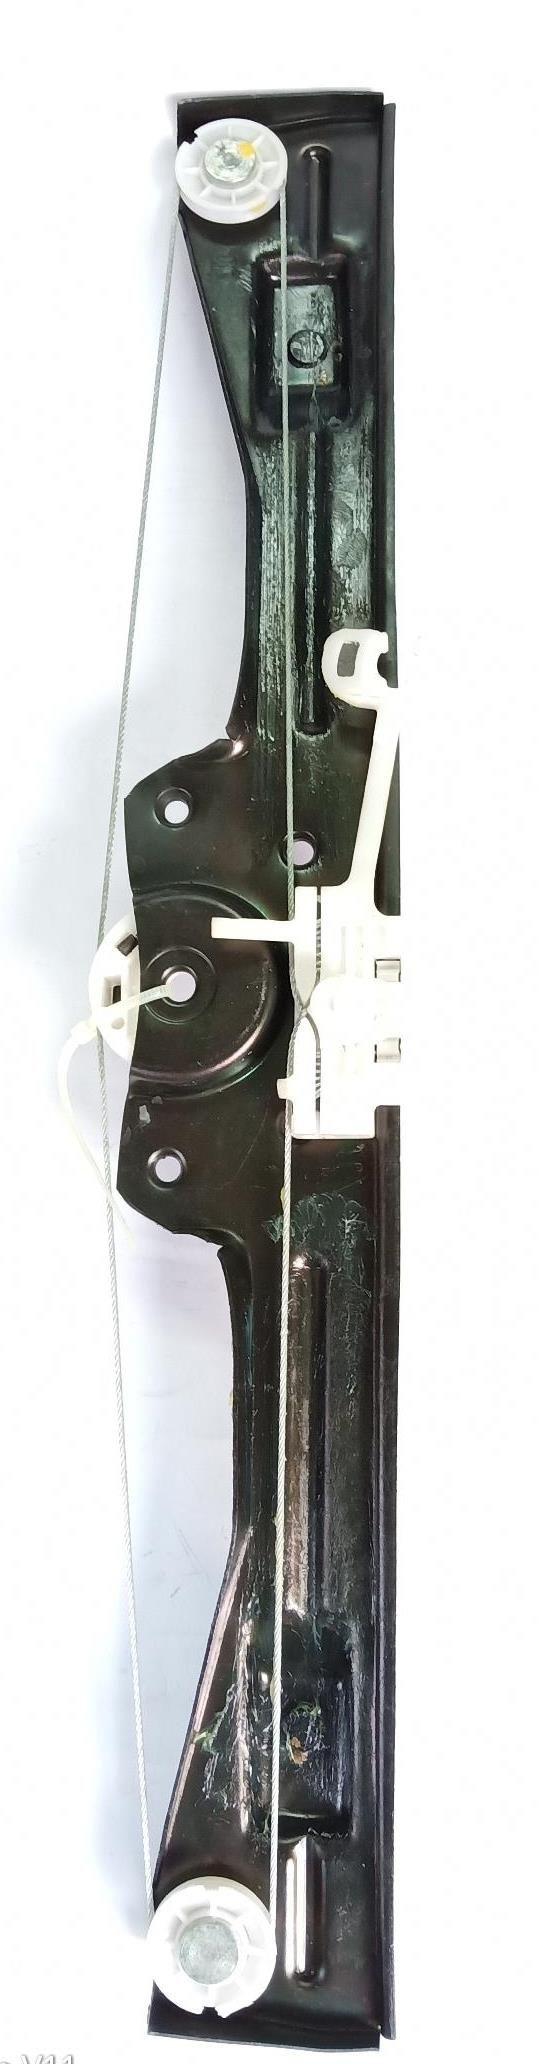 POWER WINDOW REGULATOR MACHINE/LIFTER FOR FIAT PUNTO FRONT LEFT